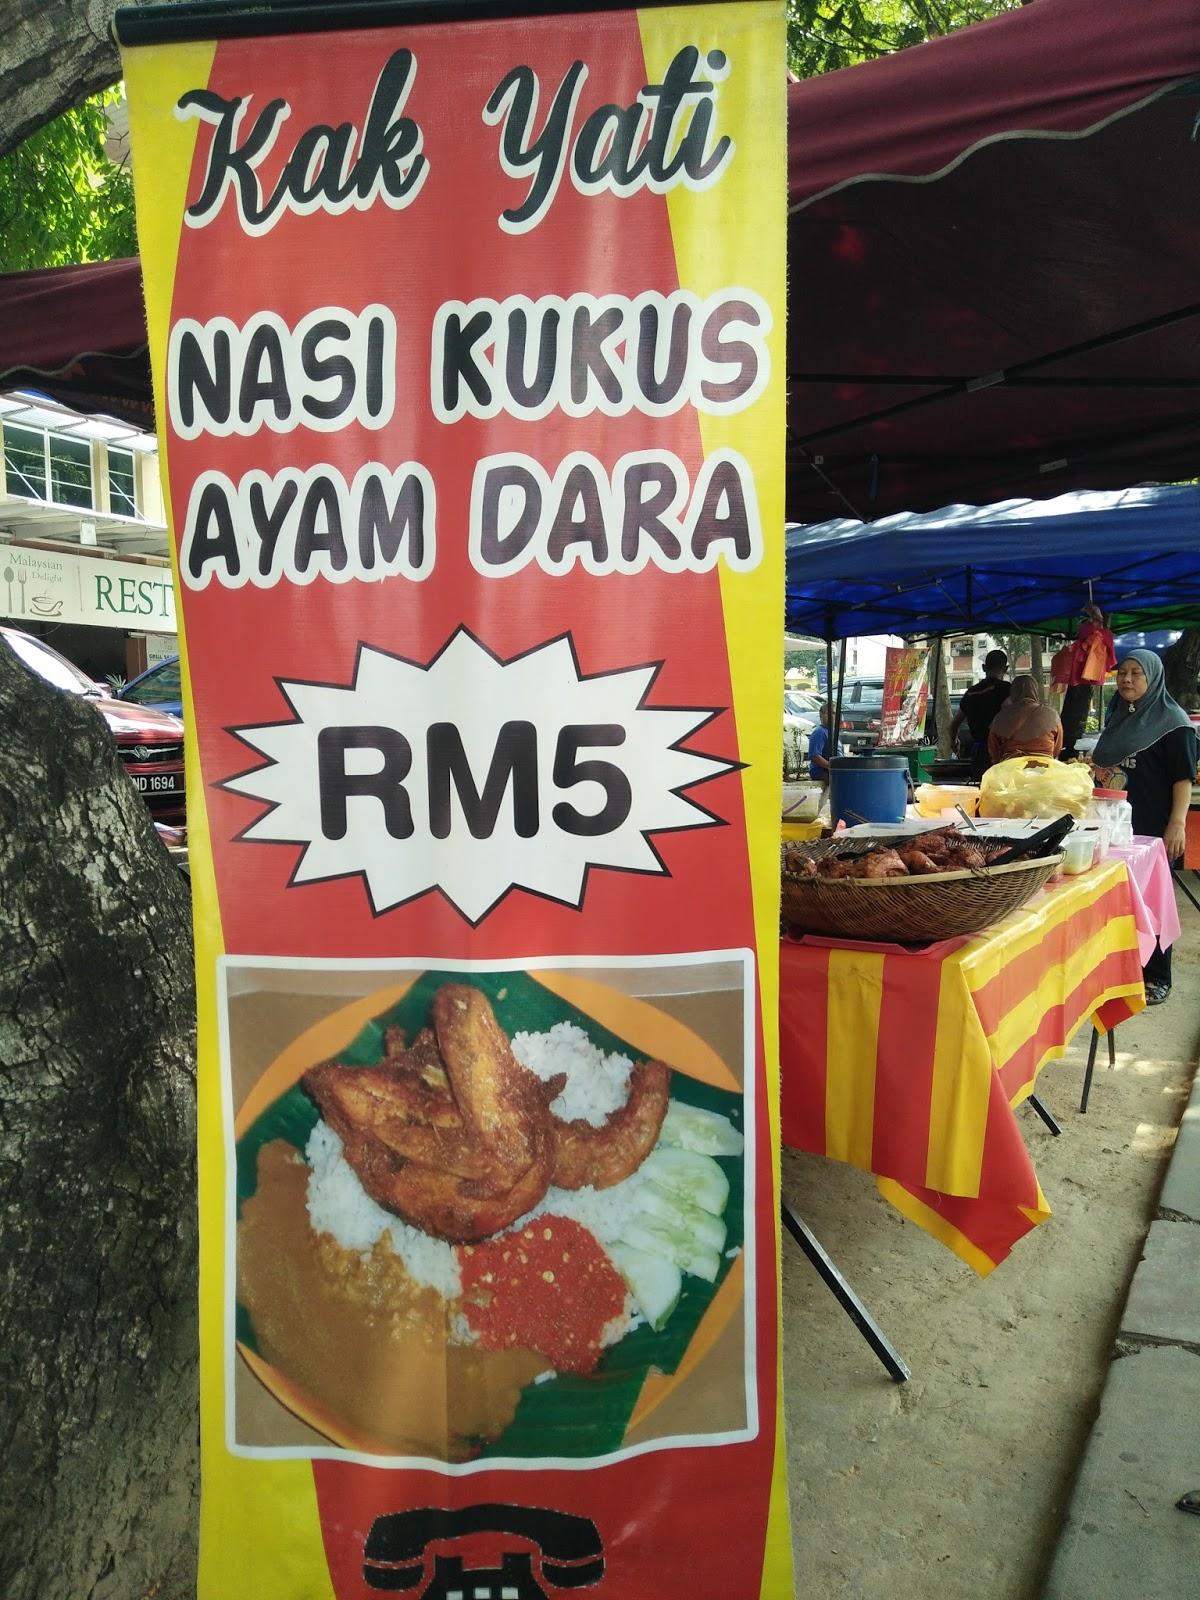 Asian Food Nasi Kukus Ayam Dara Kak Yati